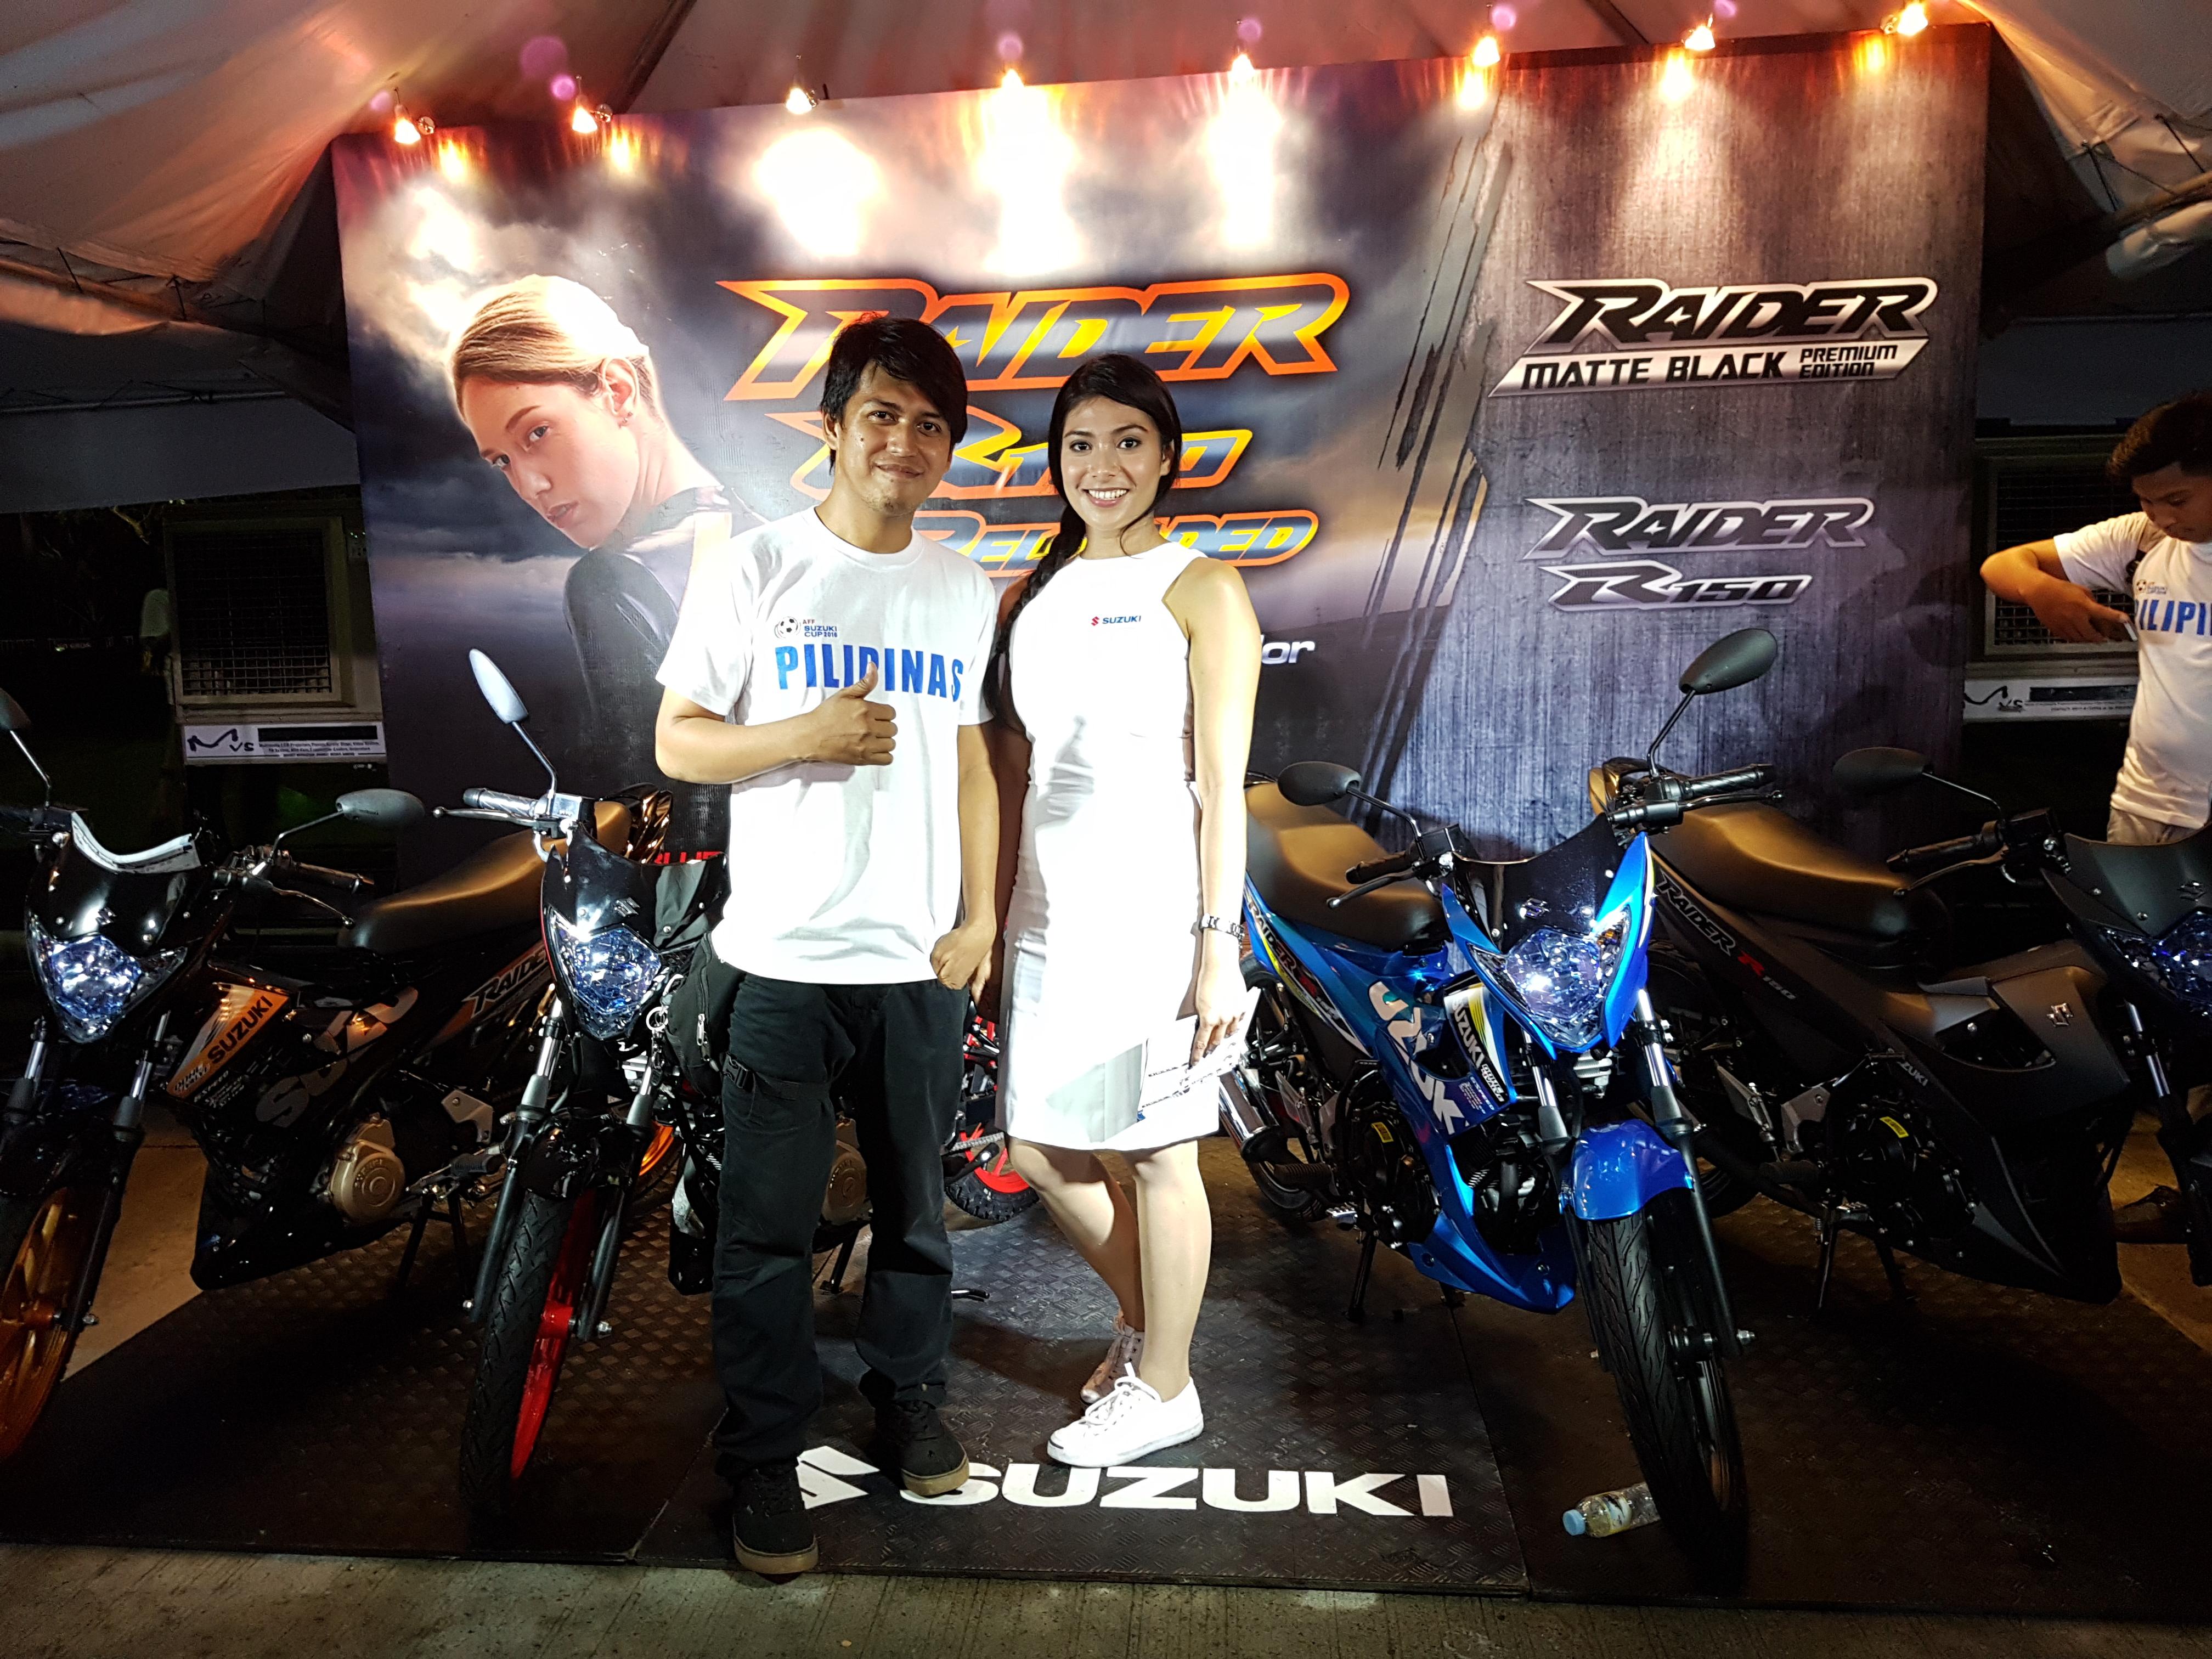 suzuki-motorcycle-display